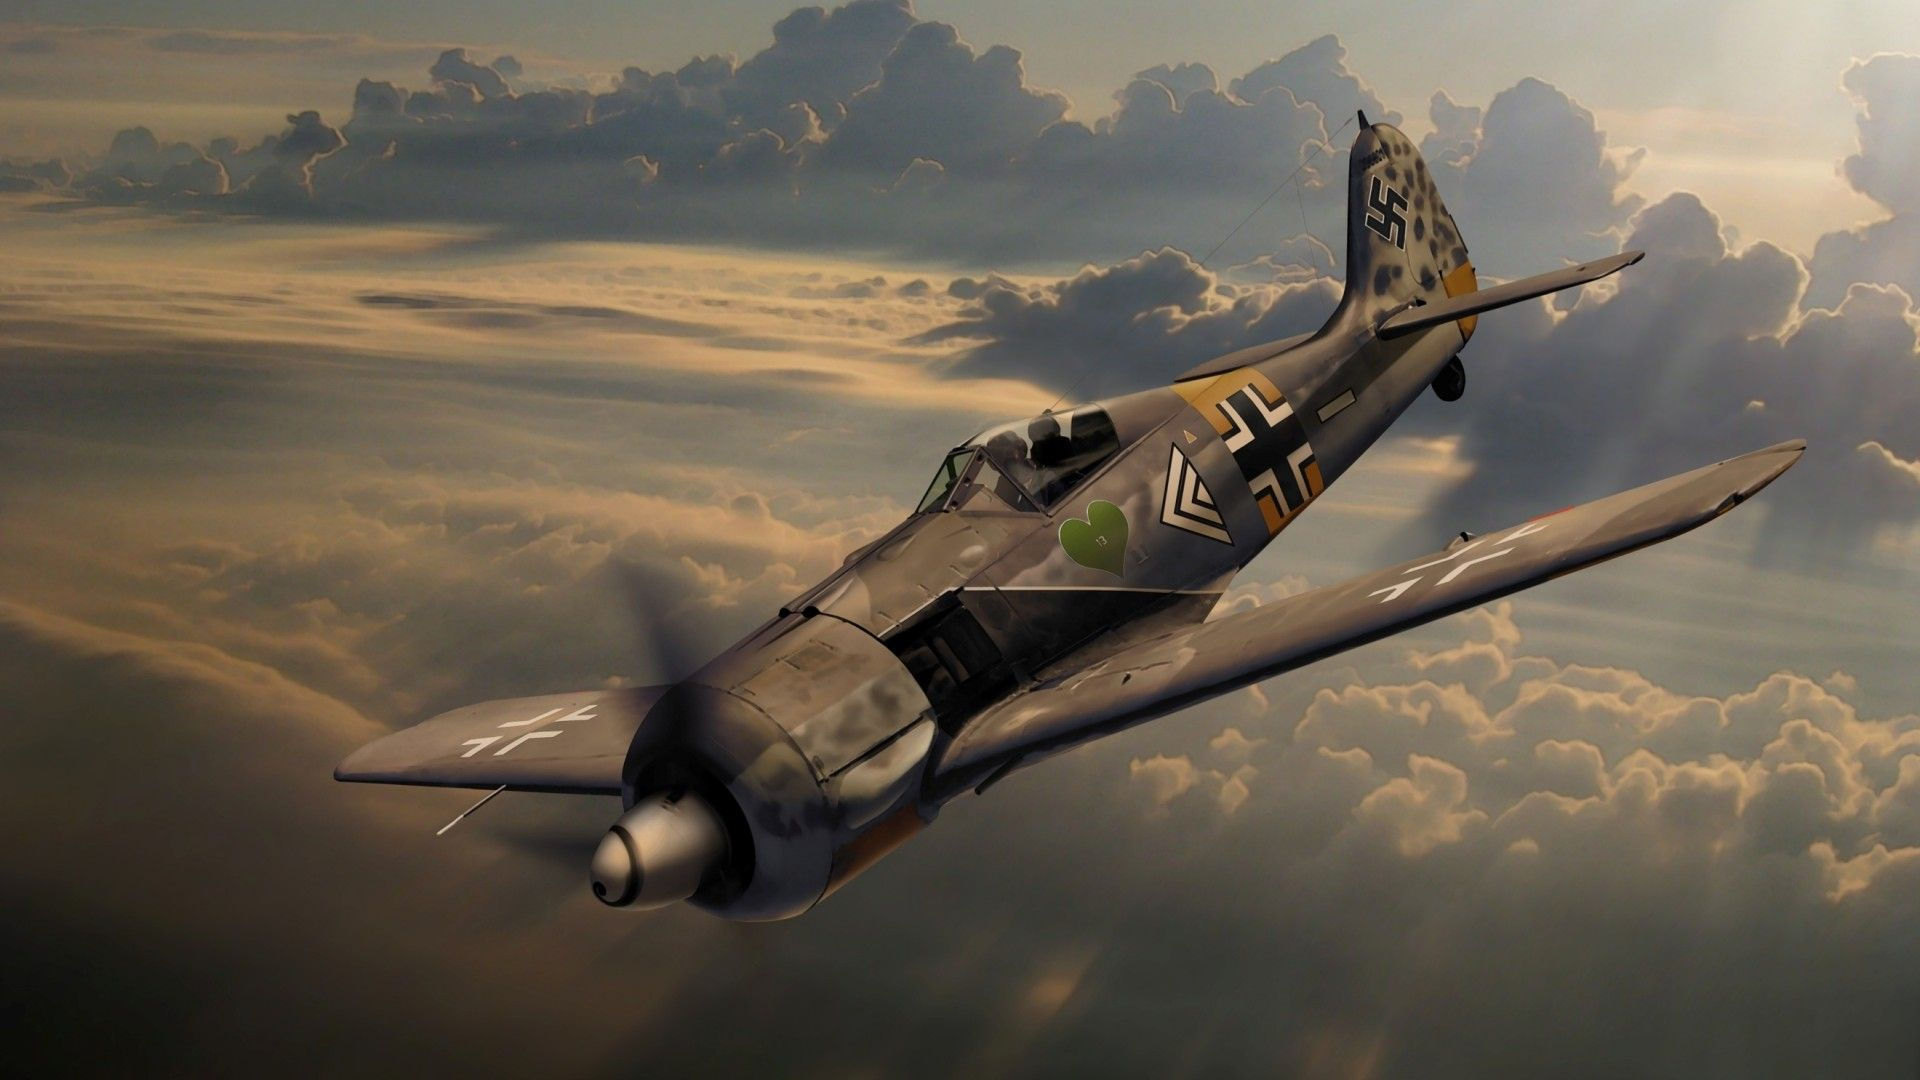 Focke Wulf German World War 2 Aircraft Wallpaper Http Www Gbwallpapers Com Focke Wulf German World War 2 Aircraft Wallpaper Aircraft Focke Wulf German